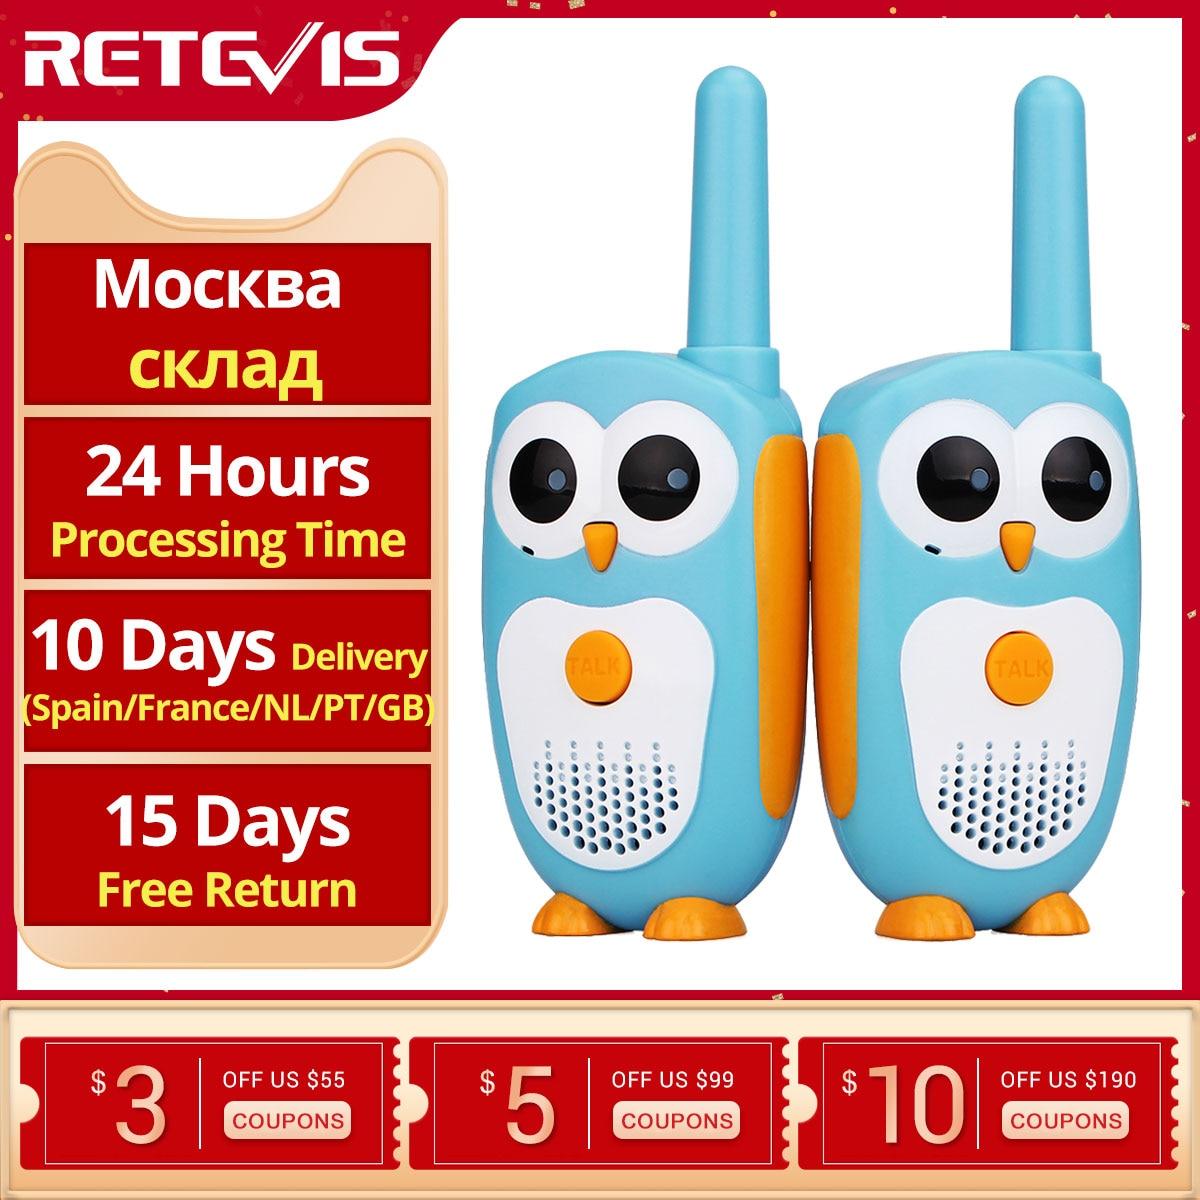 Retevis RT30 Walkie Talkie Children 2pcs Cartoon Owl Design Children's radio 0.5W Walky Talky Best Gifts Toys For Boys And Girls